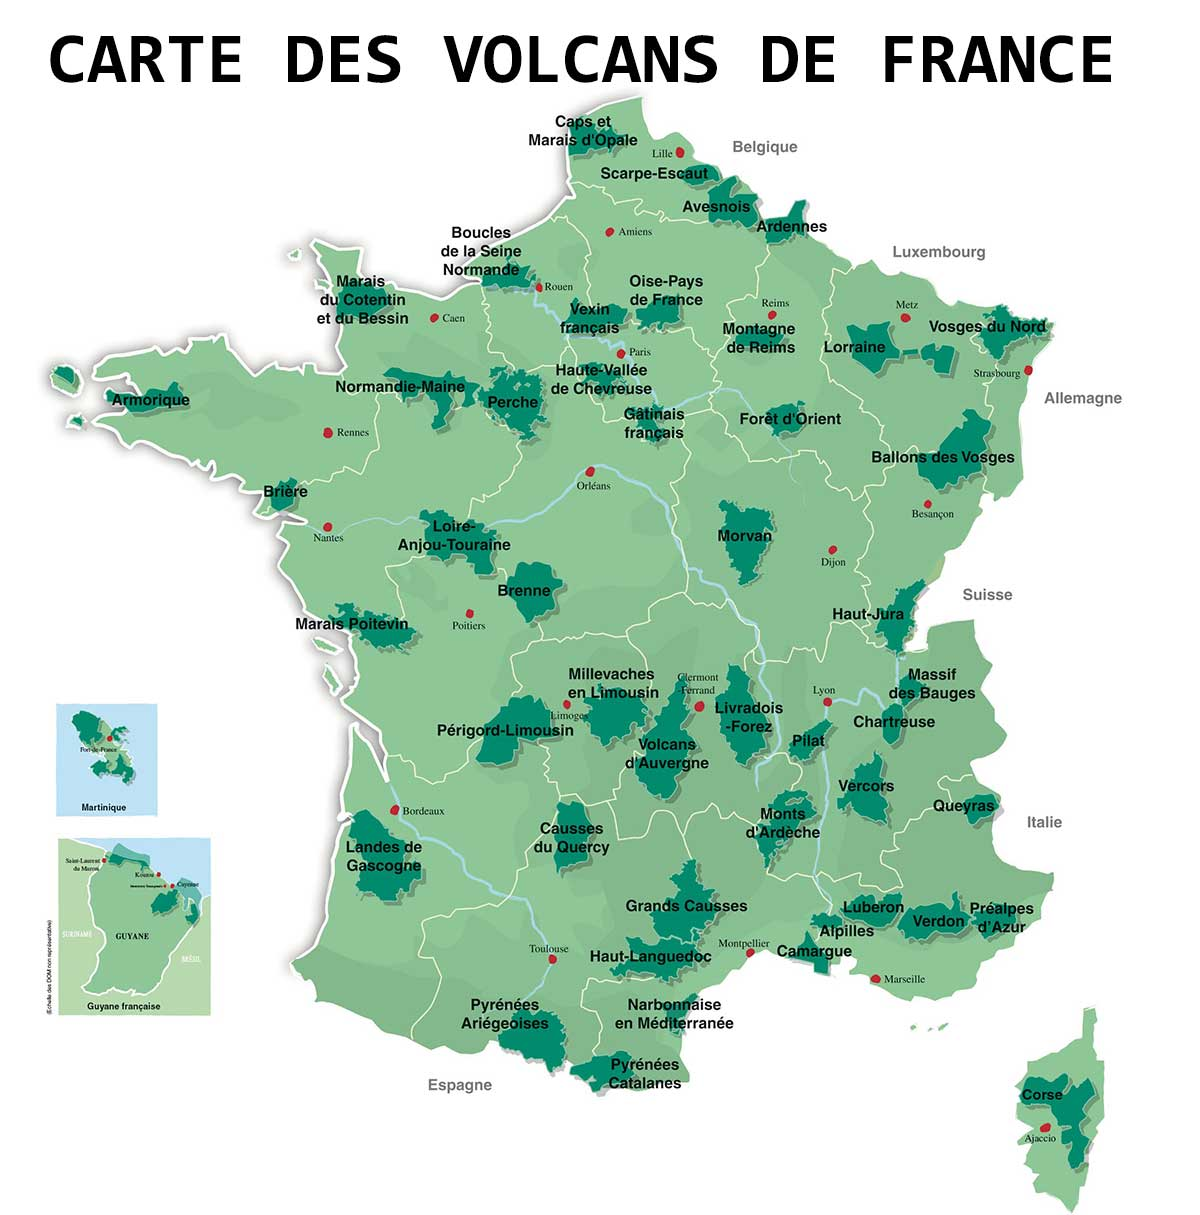 carte-des-volcans-en-france - Photos